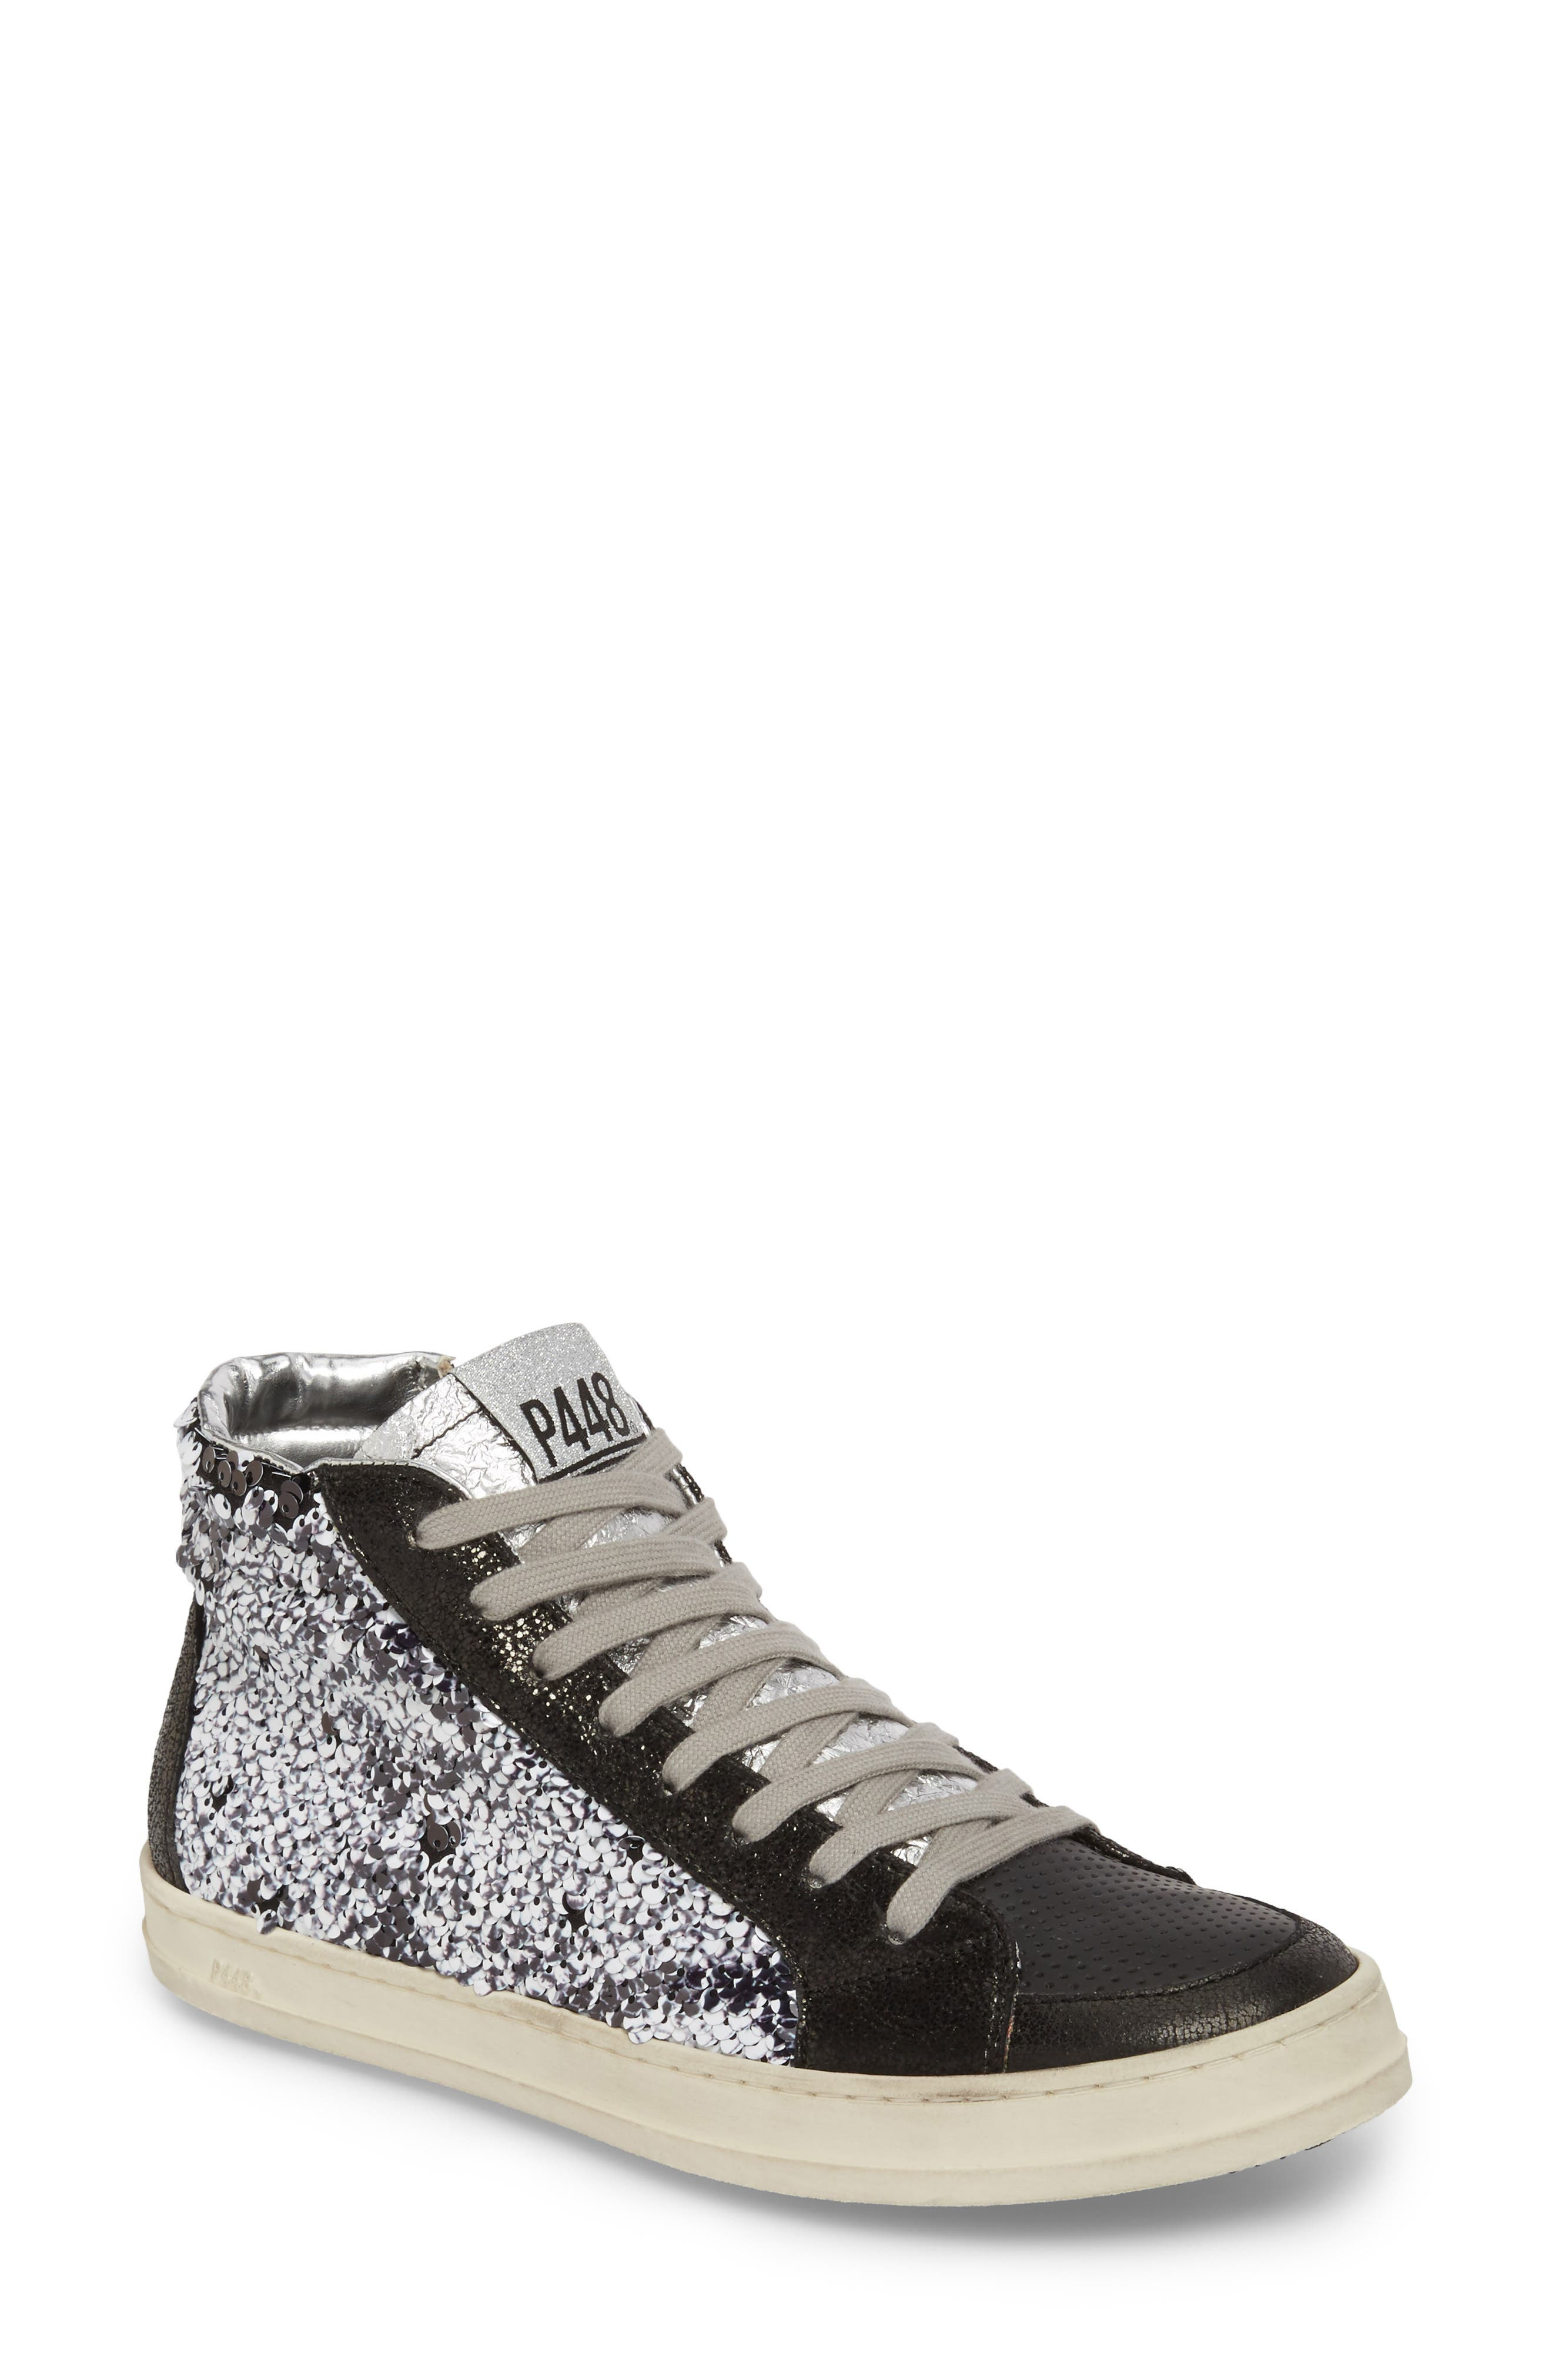 P448 Skate Sequin High Top Sneaker (Women)